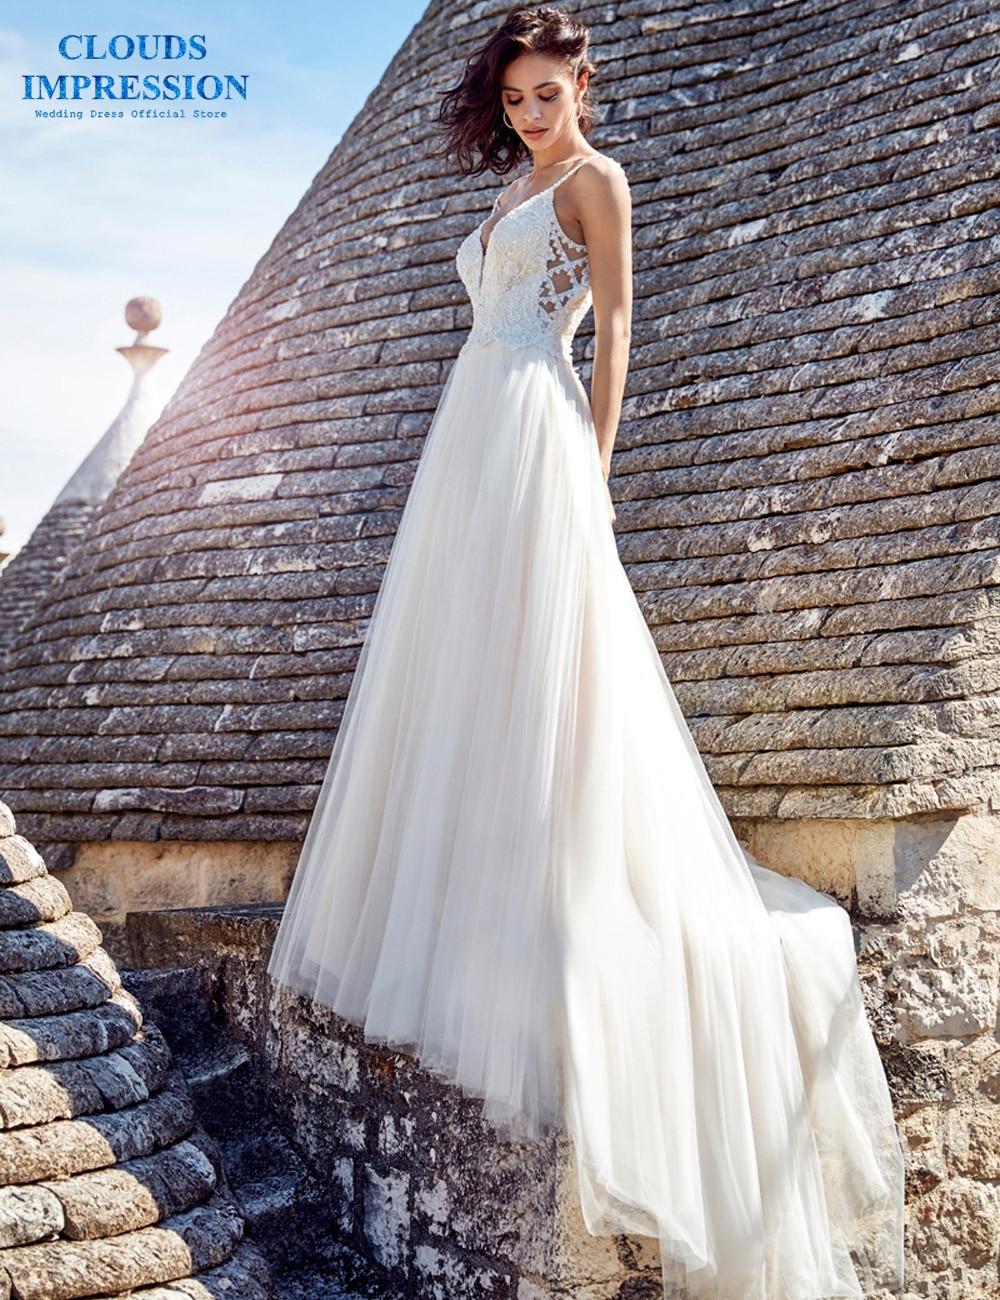 ca46ae2a95ae CLOUDS IMPRESSION Sexy Sweetheart 2019 Beach A-Line BOHO Wedding Dress  Beading Vestige De Noiva Bridal Dress Spaghetti Straps ~ Premium Deal July  2019